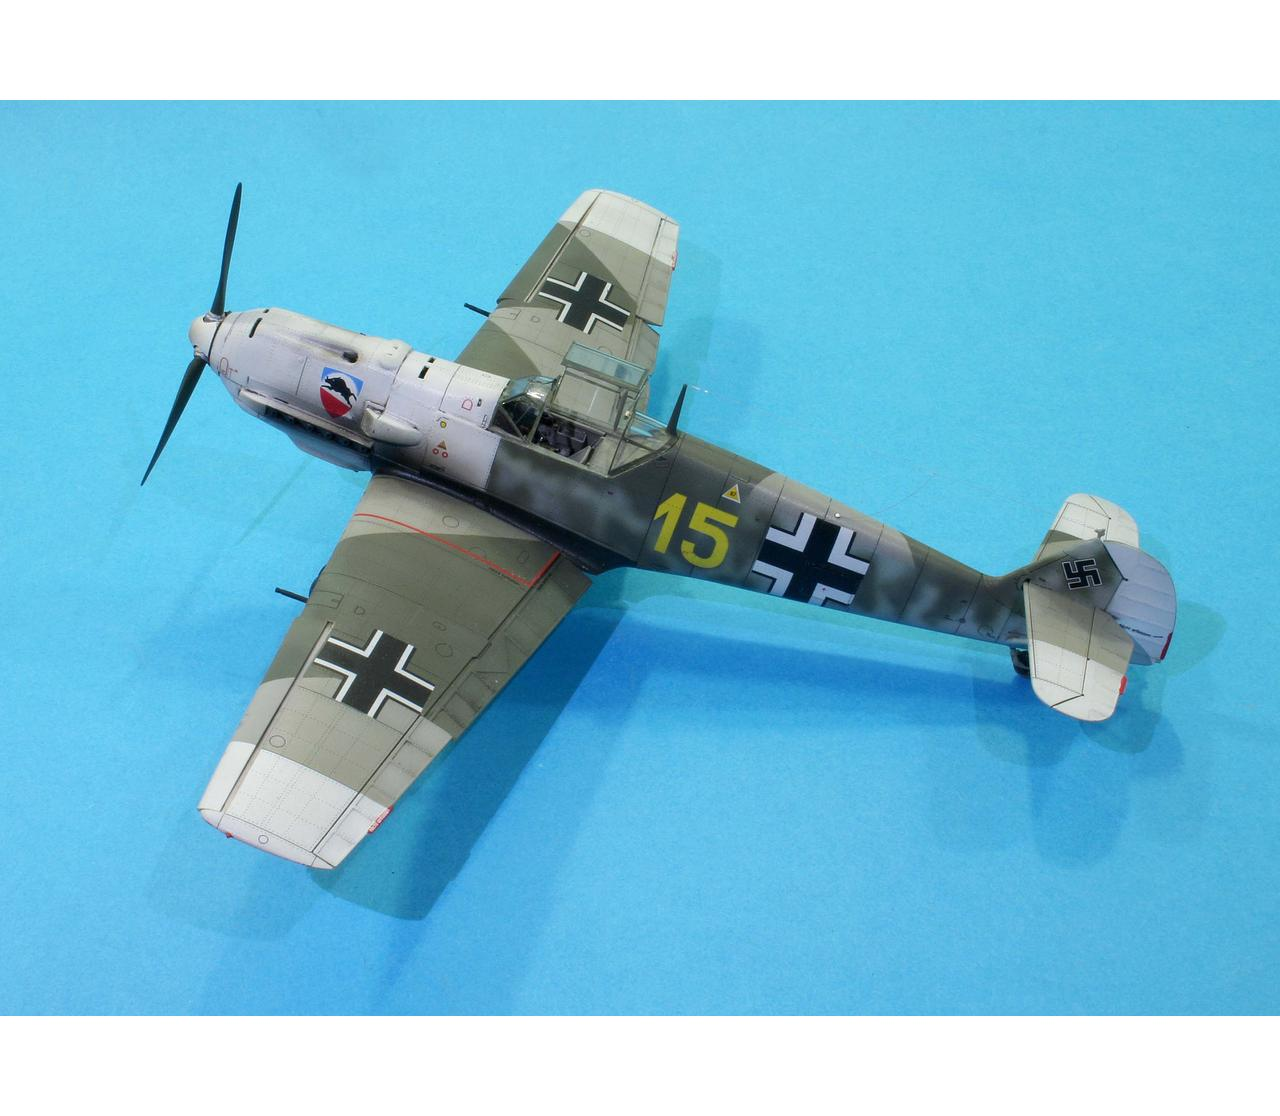 Eduard Plastic Kits 84158-1:48 Bf 109E-1 Weekend Edition Neu